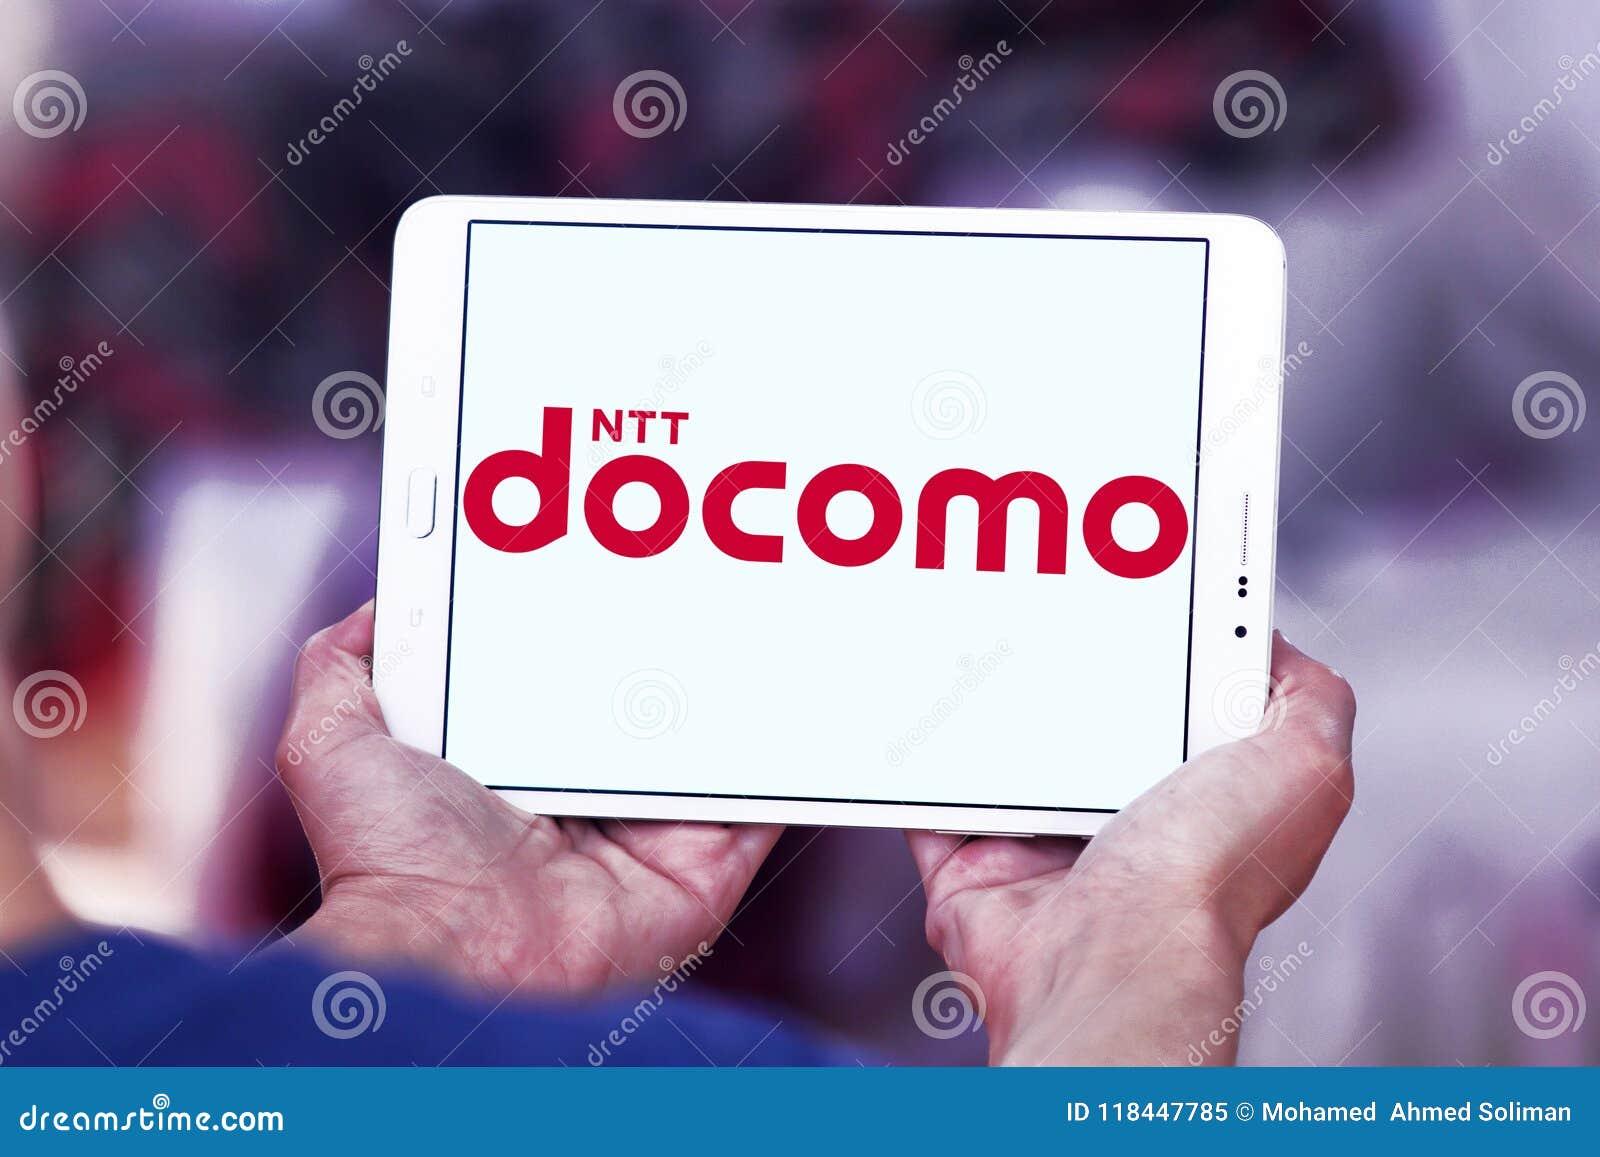 NTT DOCOMO Telecommunications Company Logo Editorial Image - Image